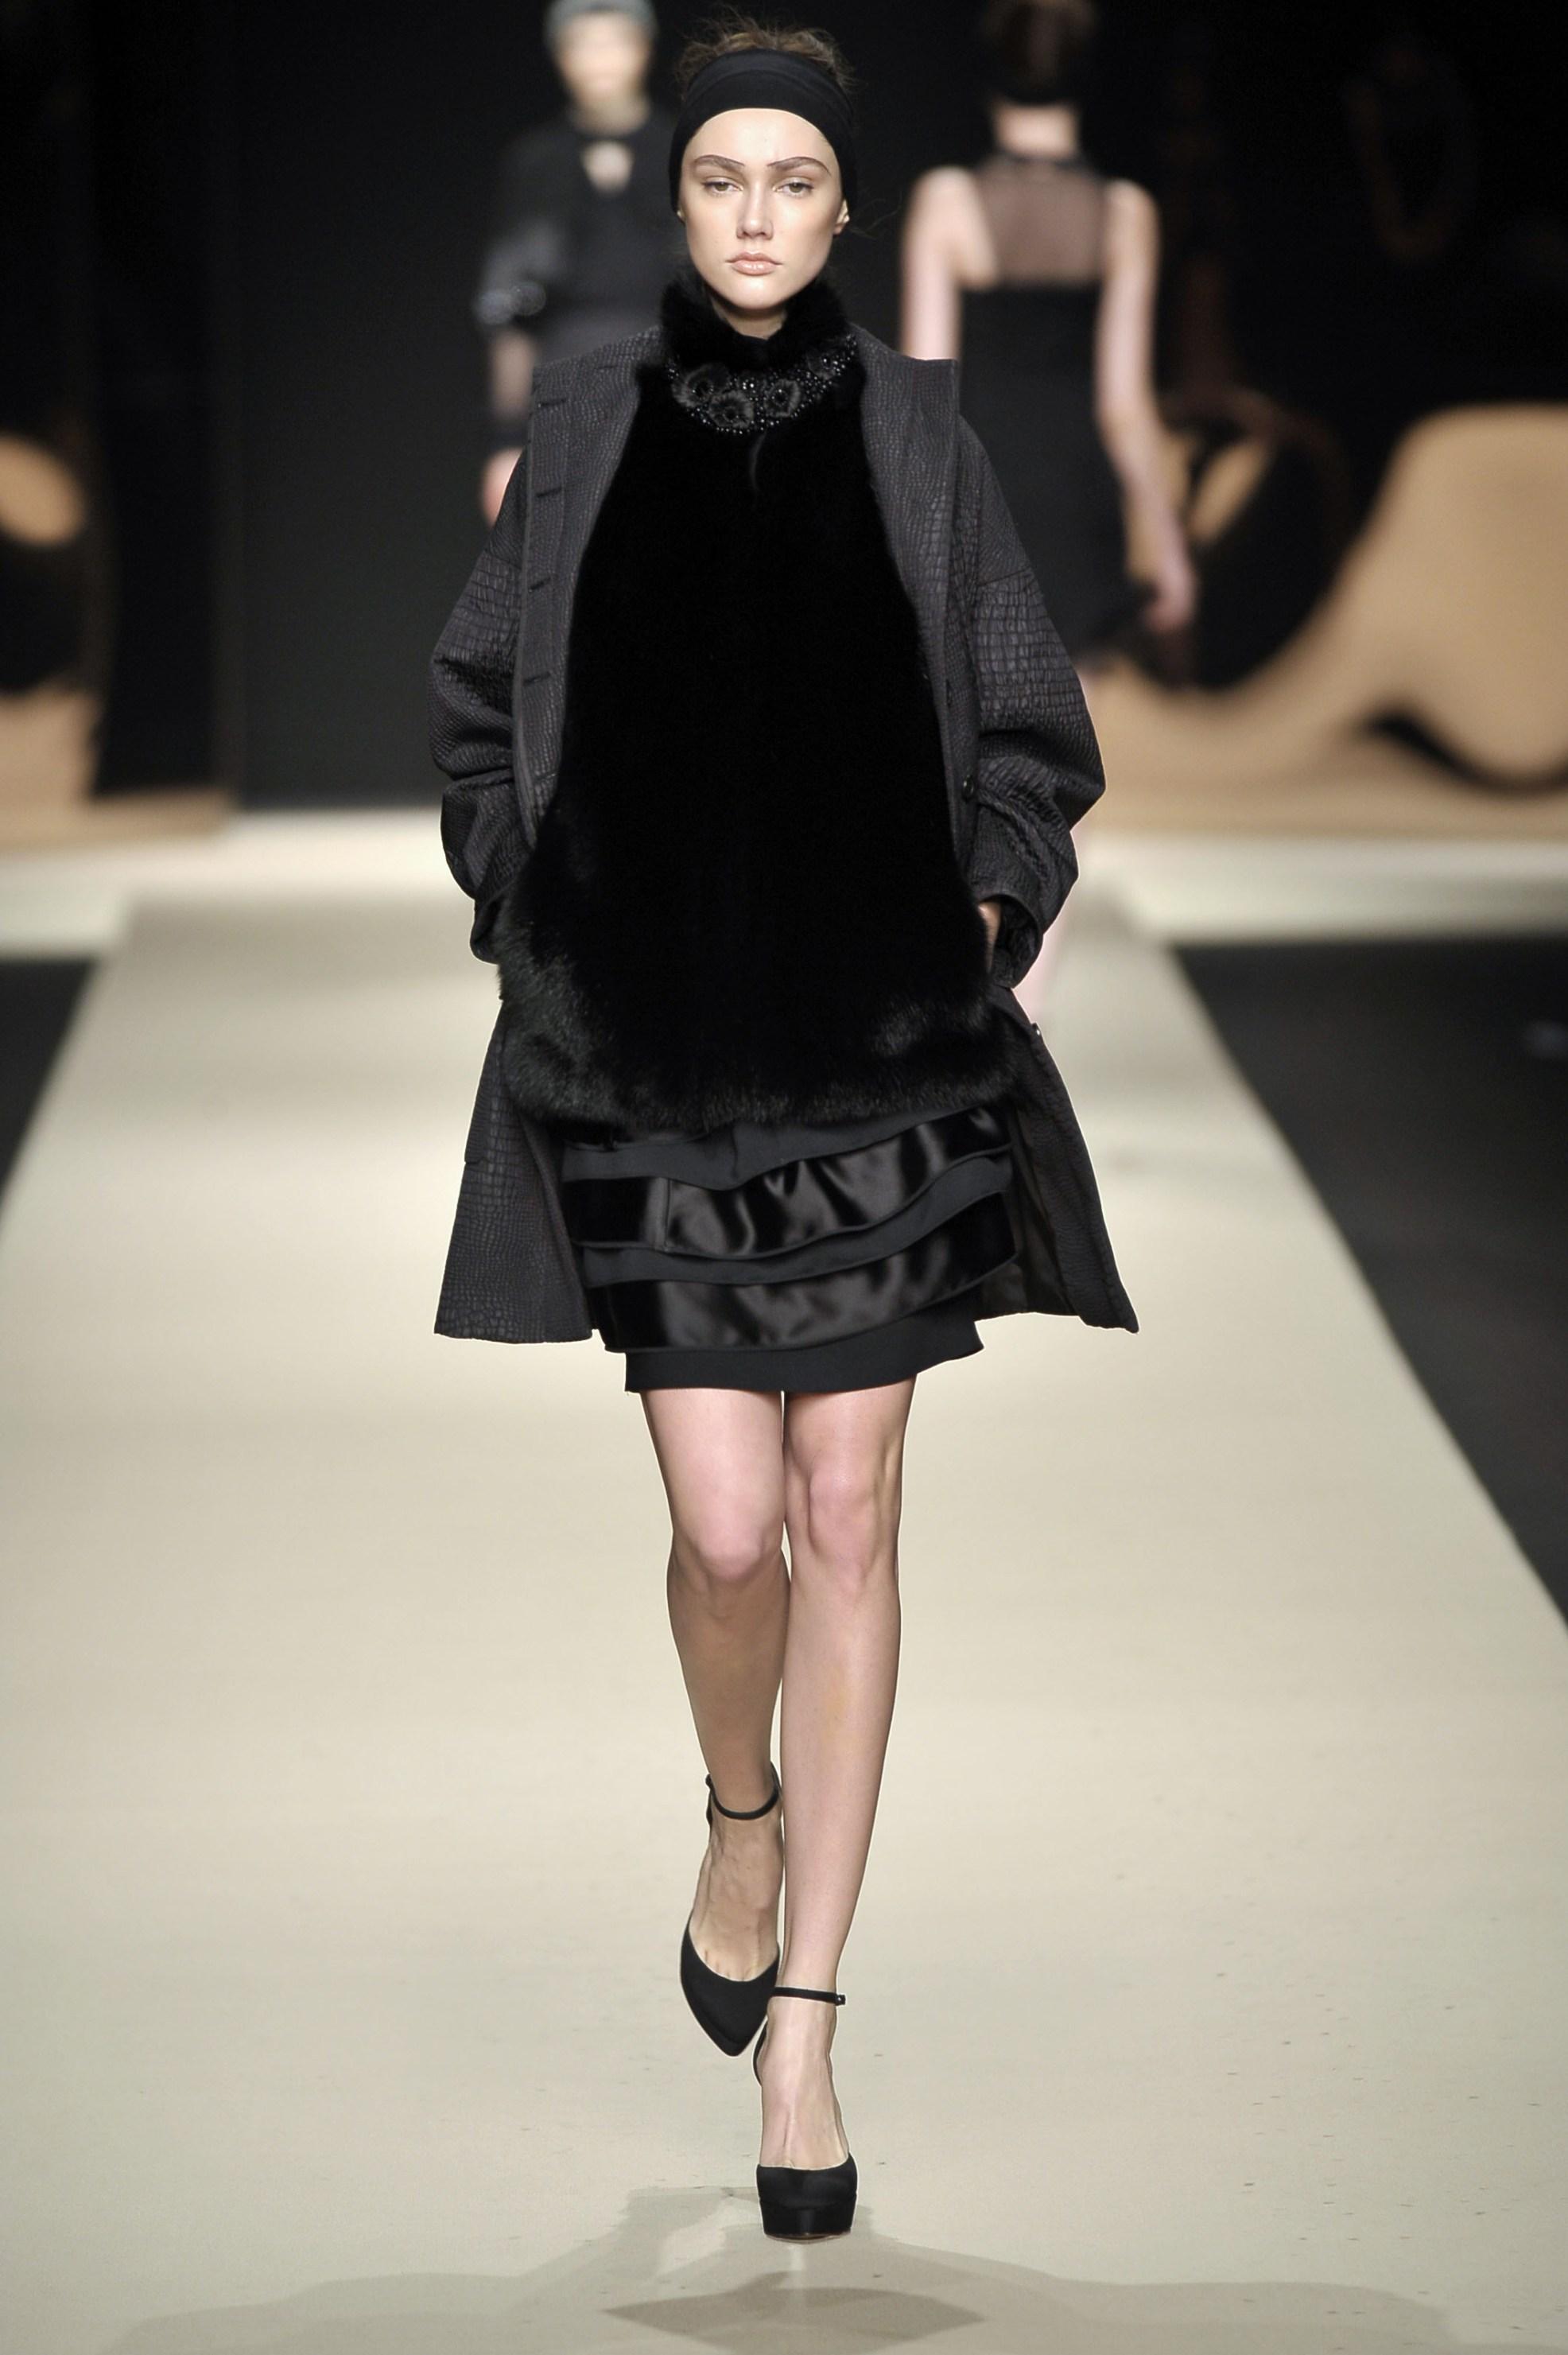 Ksenia kahnovich fashion spot 2018 Women S images on Pinterest Fashion news